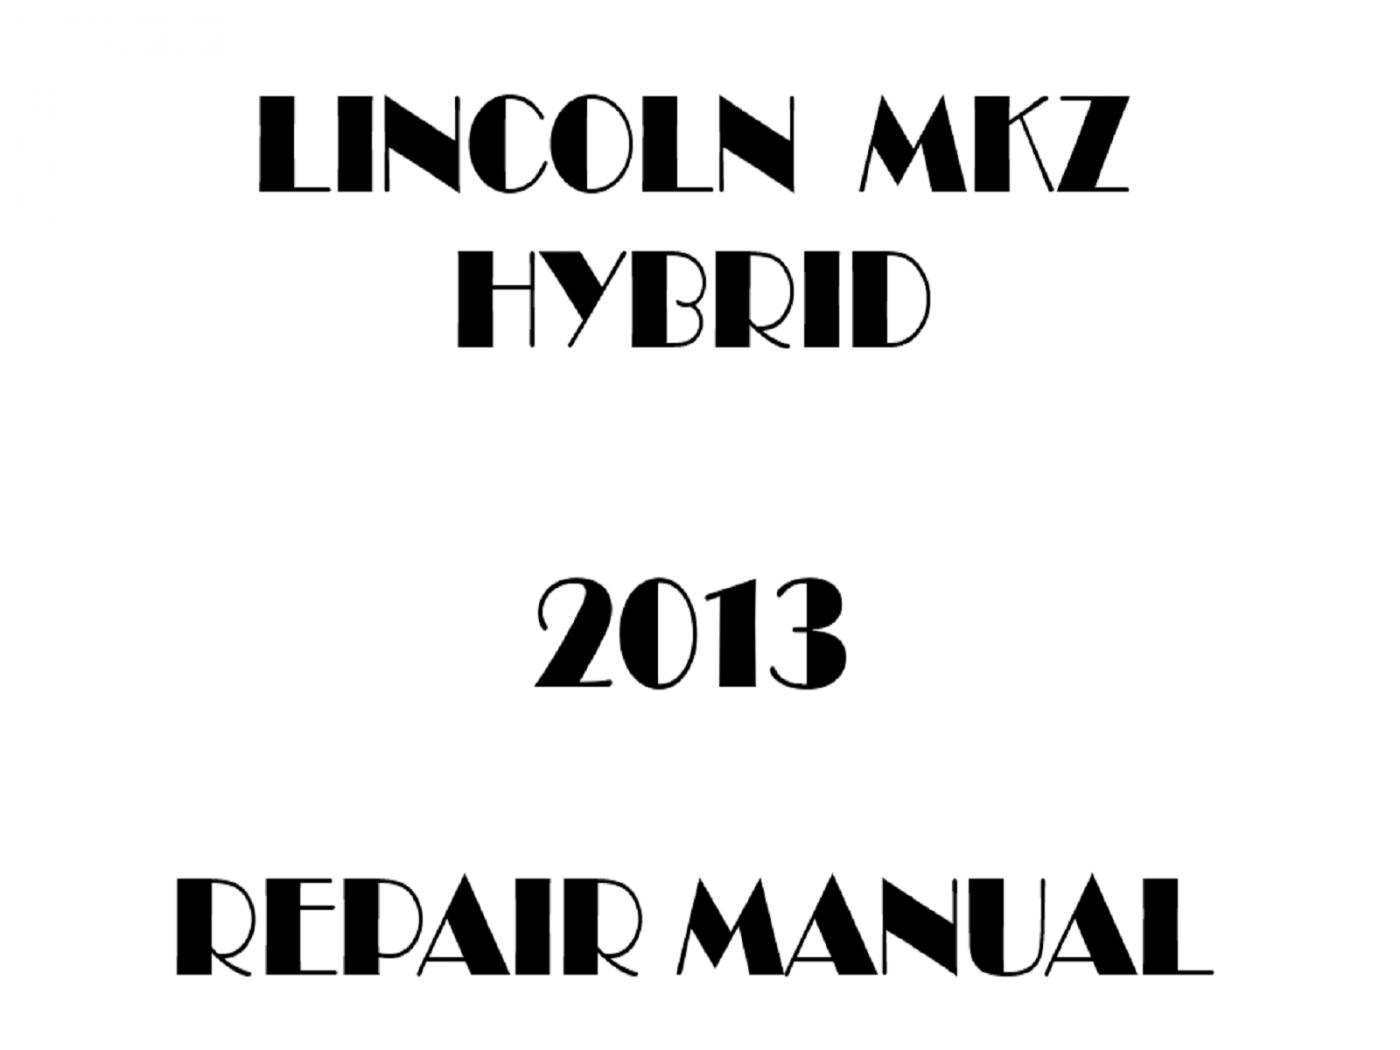 2013 Lincoln MKZ Hybrid repair manual